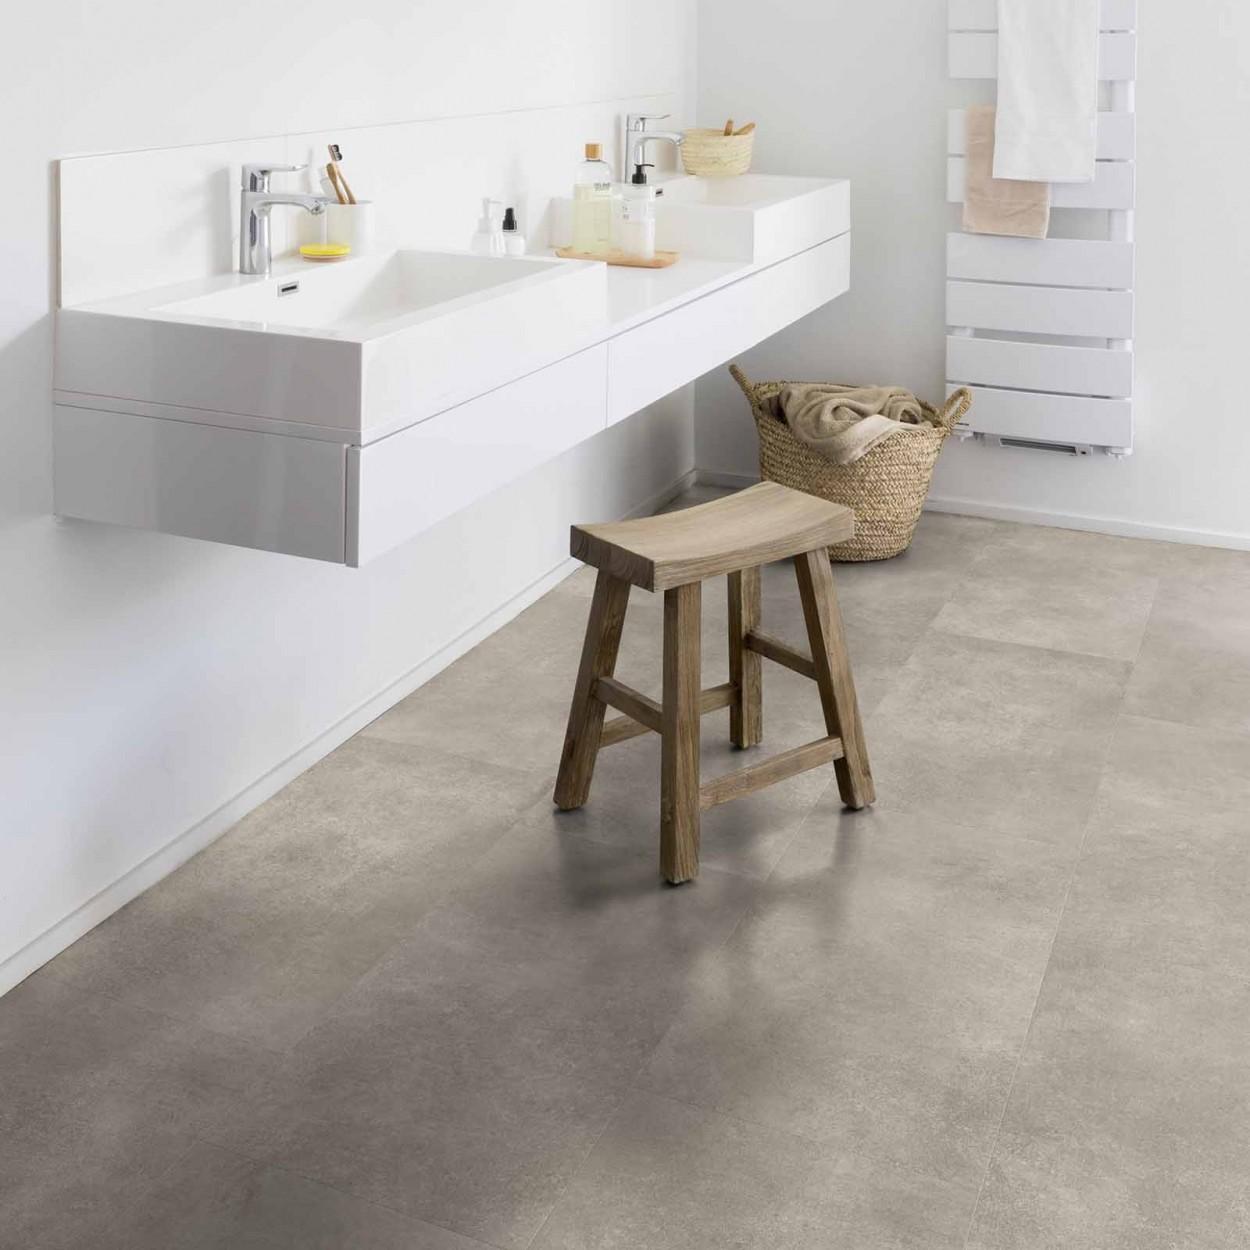 plaktegels gerflor senso lichtgrijs badkamer vloer